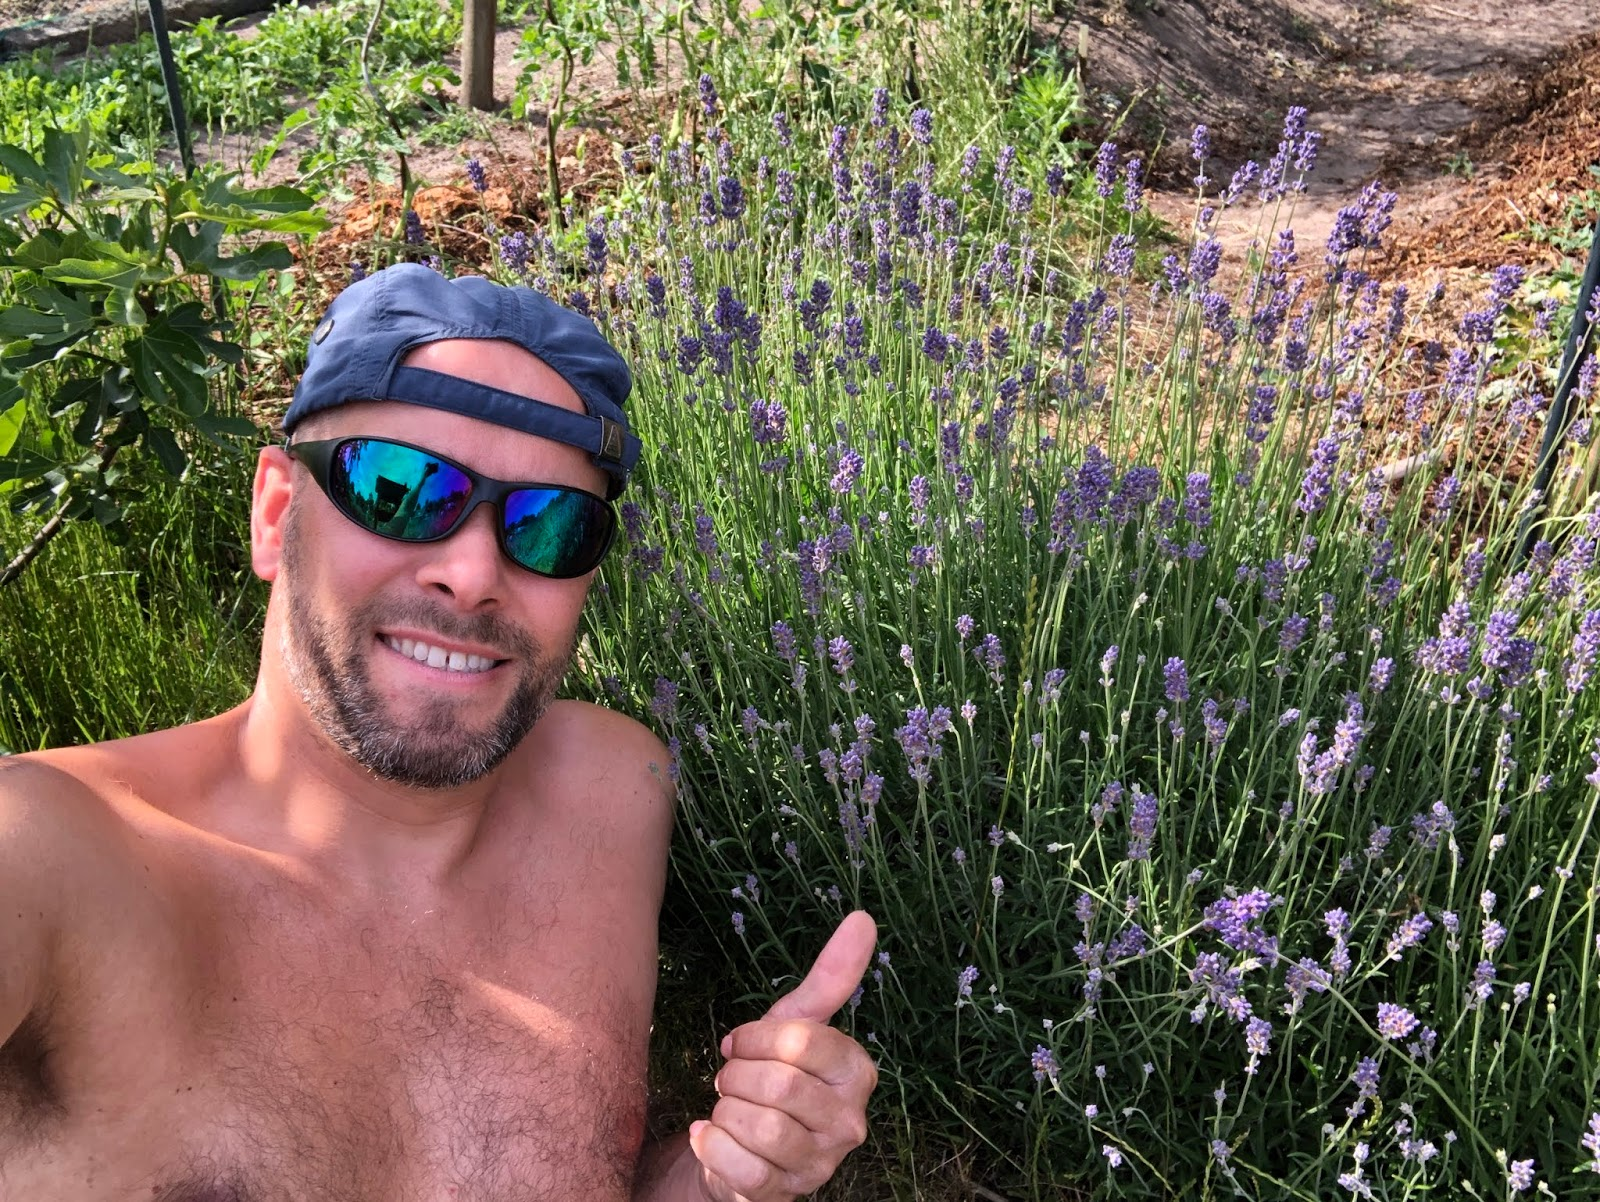 droogte 2020 moestuin volkstuin lavendel thierry baudet